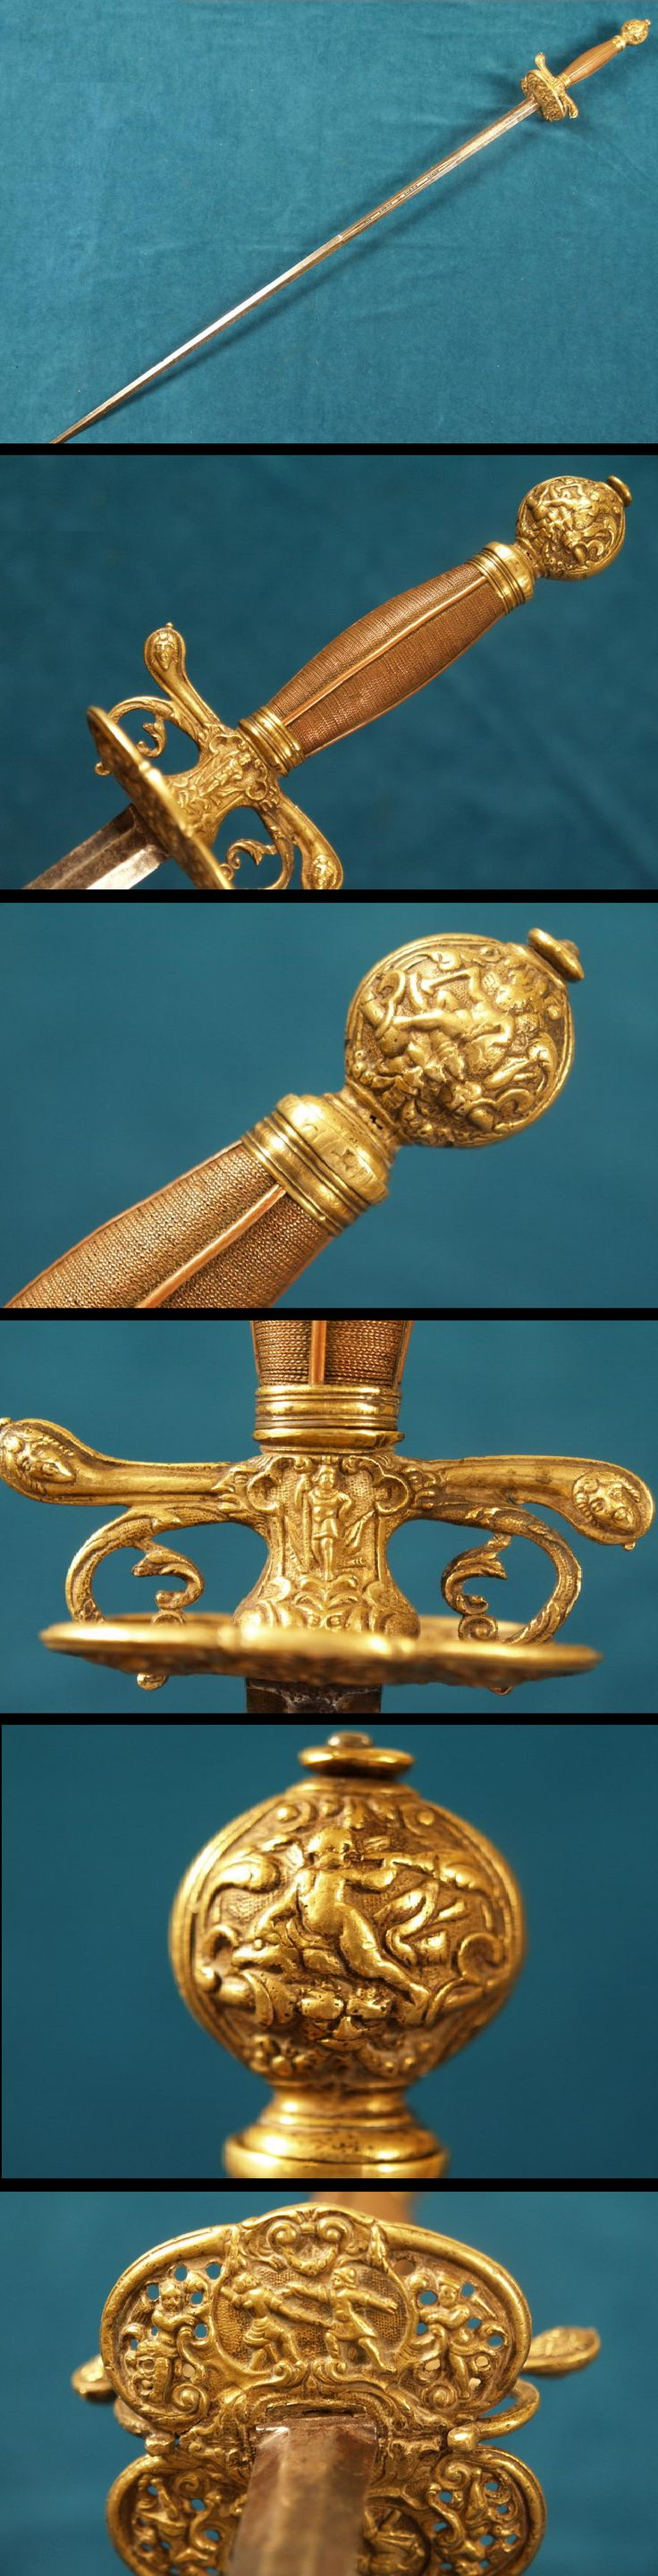 17th century Transitional Dutch Rapier Sword.